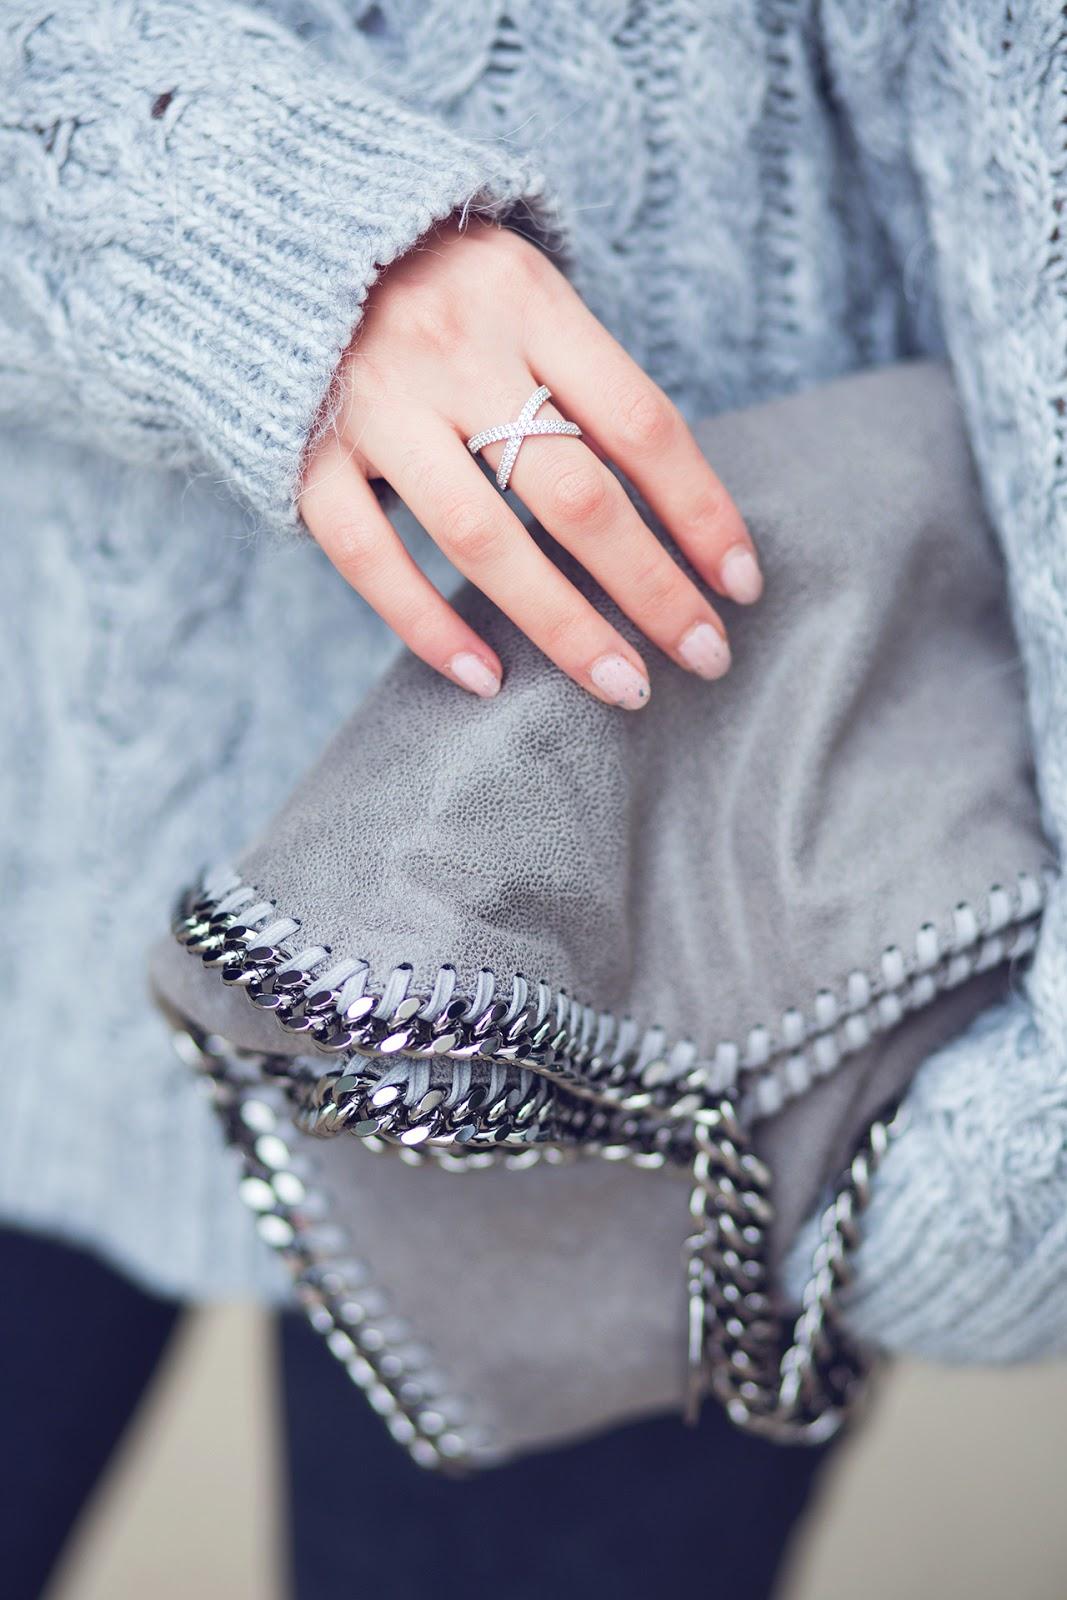 The Golden Bun | München Modeblog, German Fashion Blog, Fashionblogger, new trends